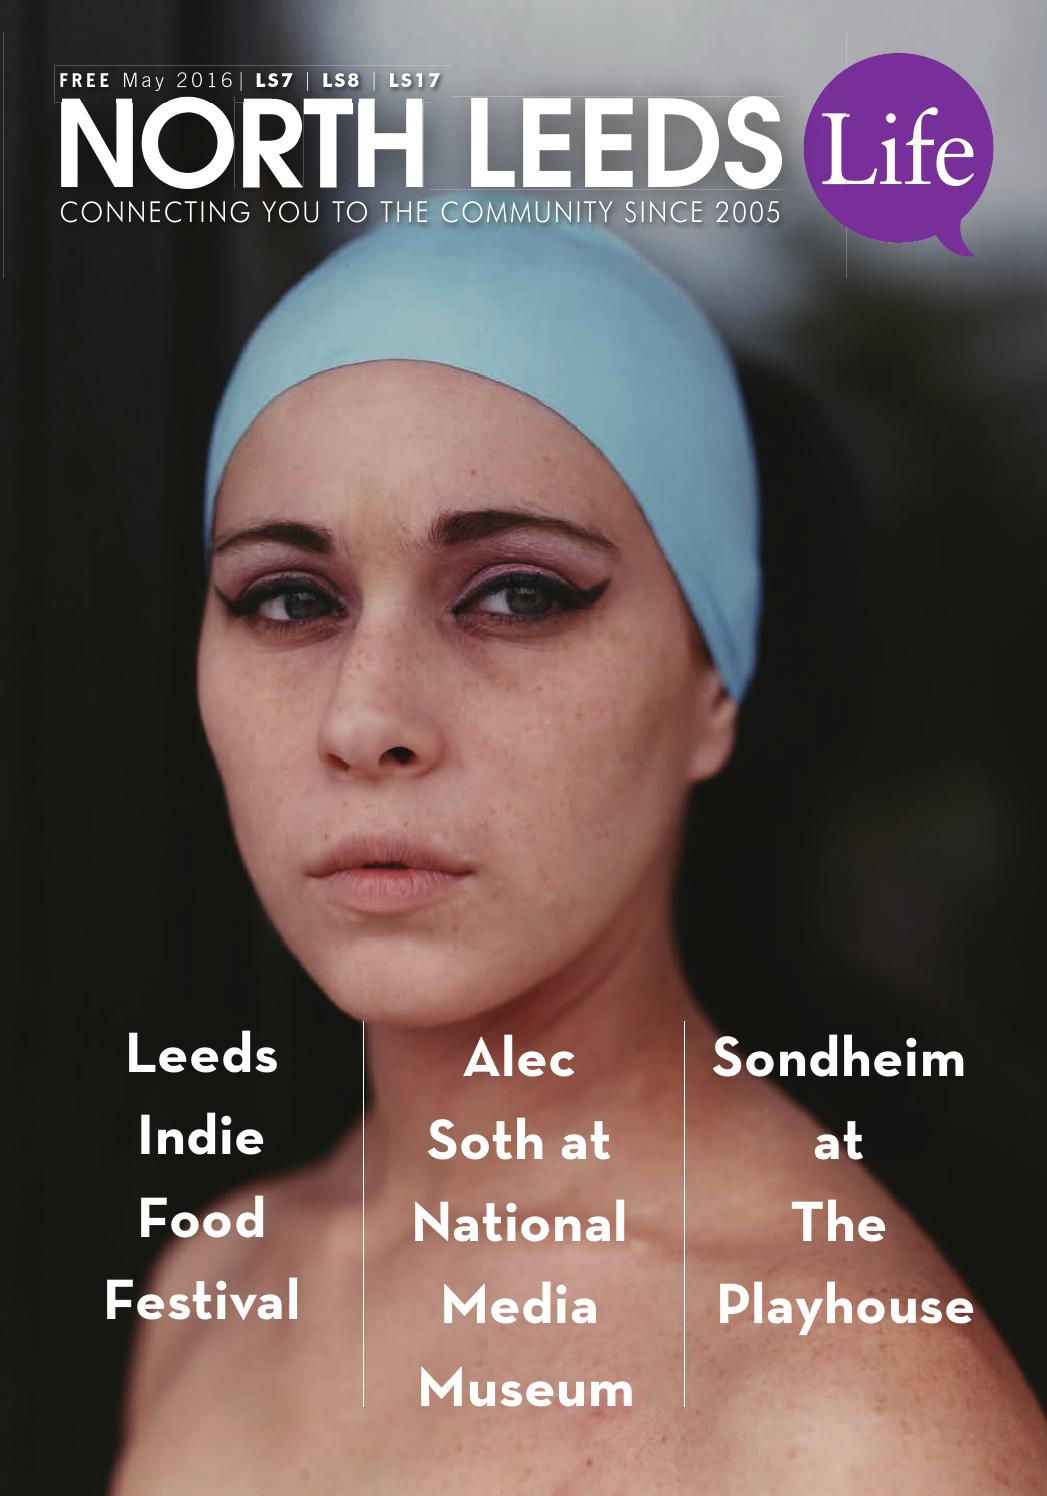 North Leeds Life Magazine May 2016 Edition Ls7 Ls8 Ls17 By North